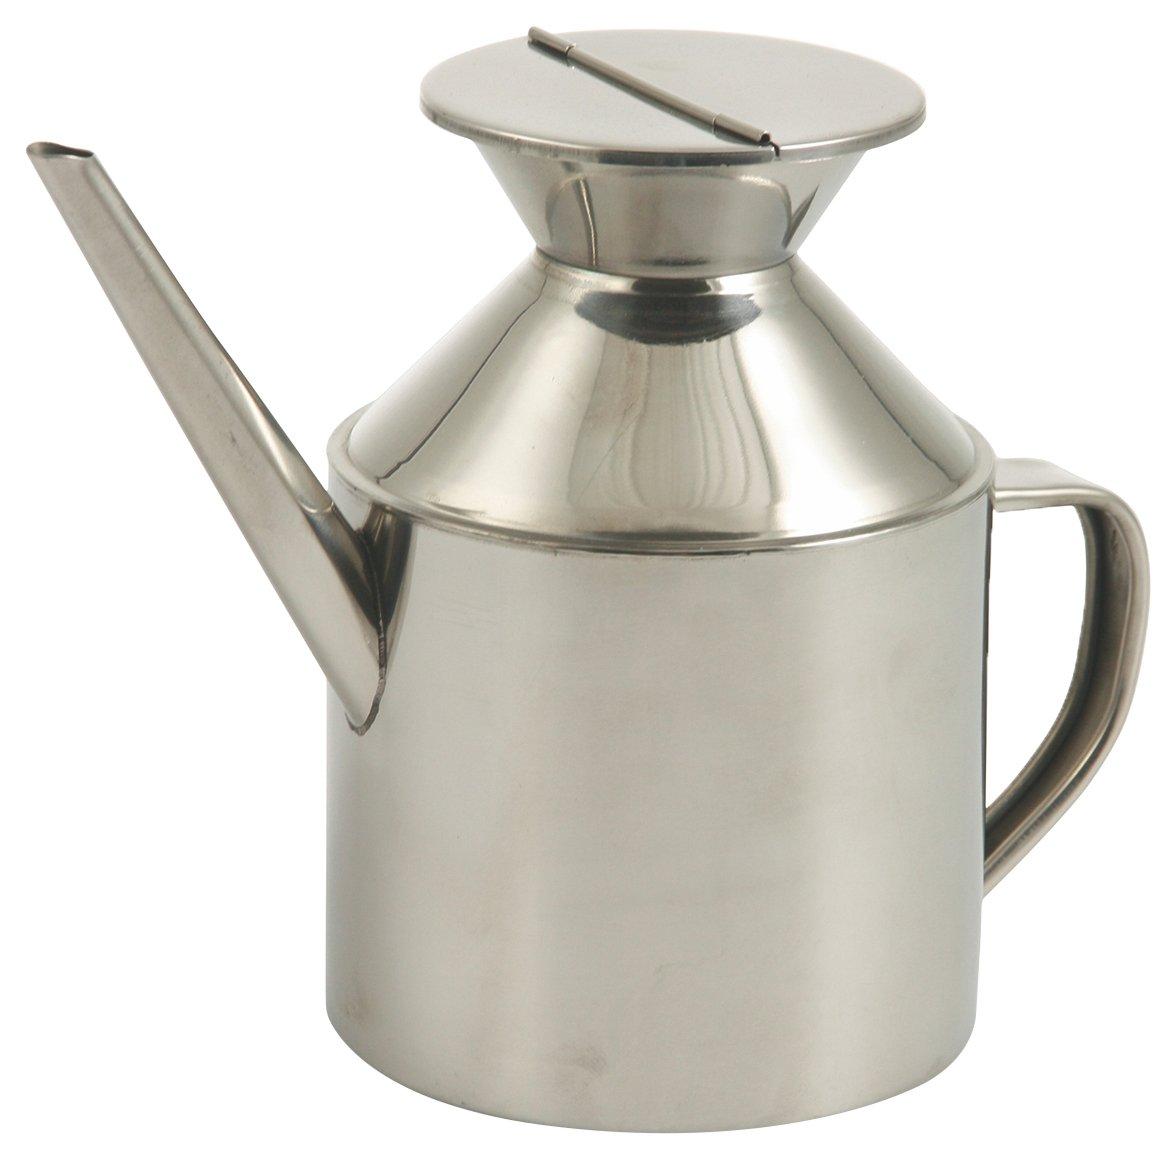 Galileo Casa Oil Style Oil Cruet, Steel, Grey, 9x 9x 13.5cm Galileo Spa 2403963 2403963_silver